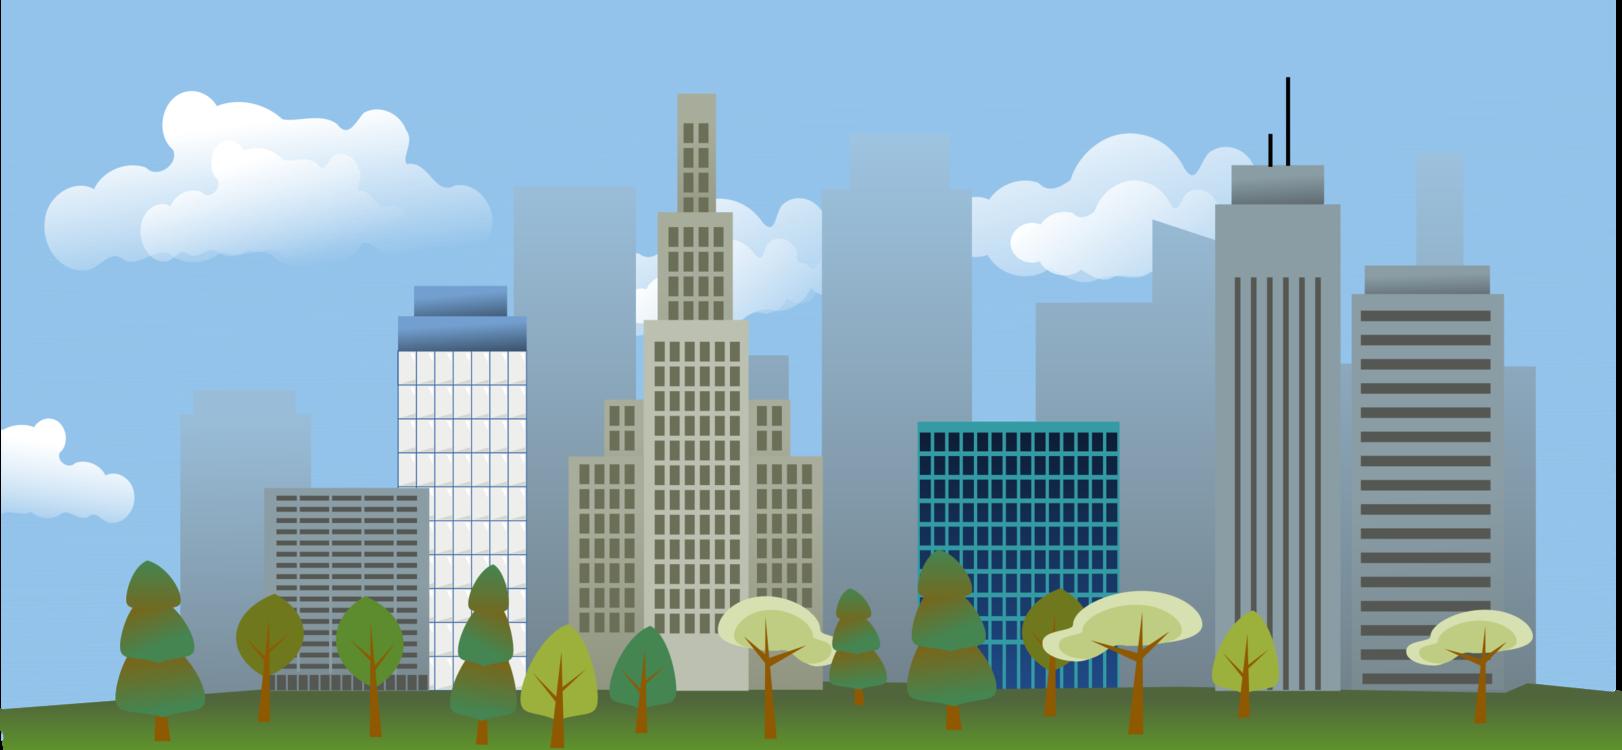 skyline clipart urban design